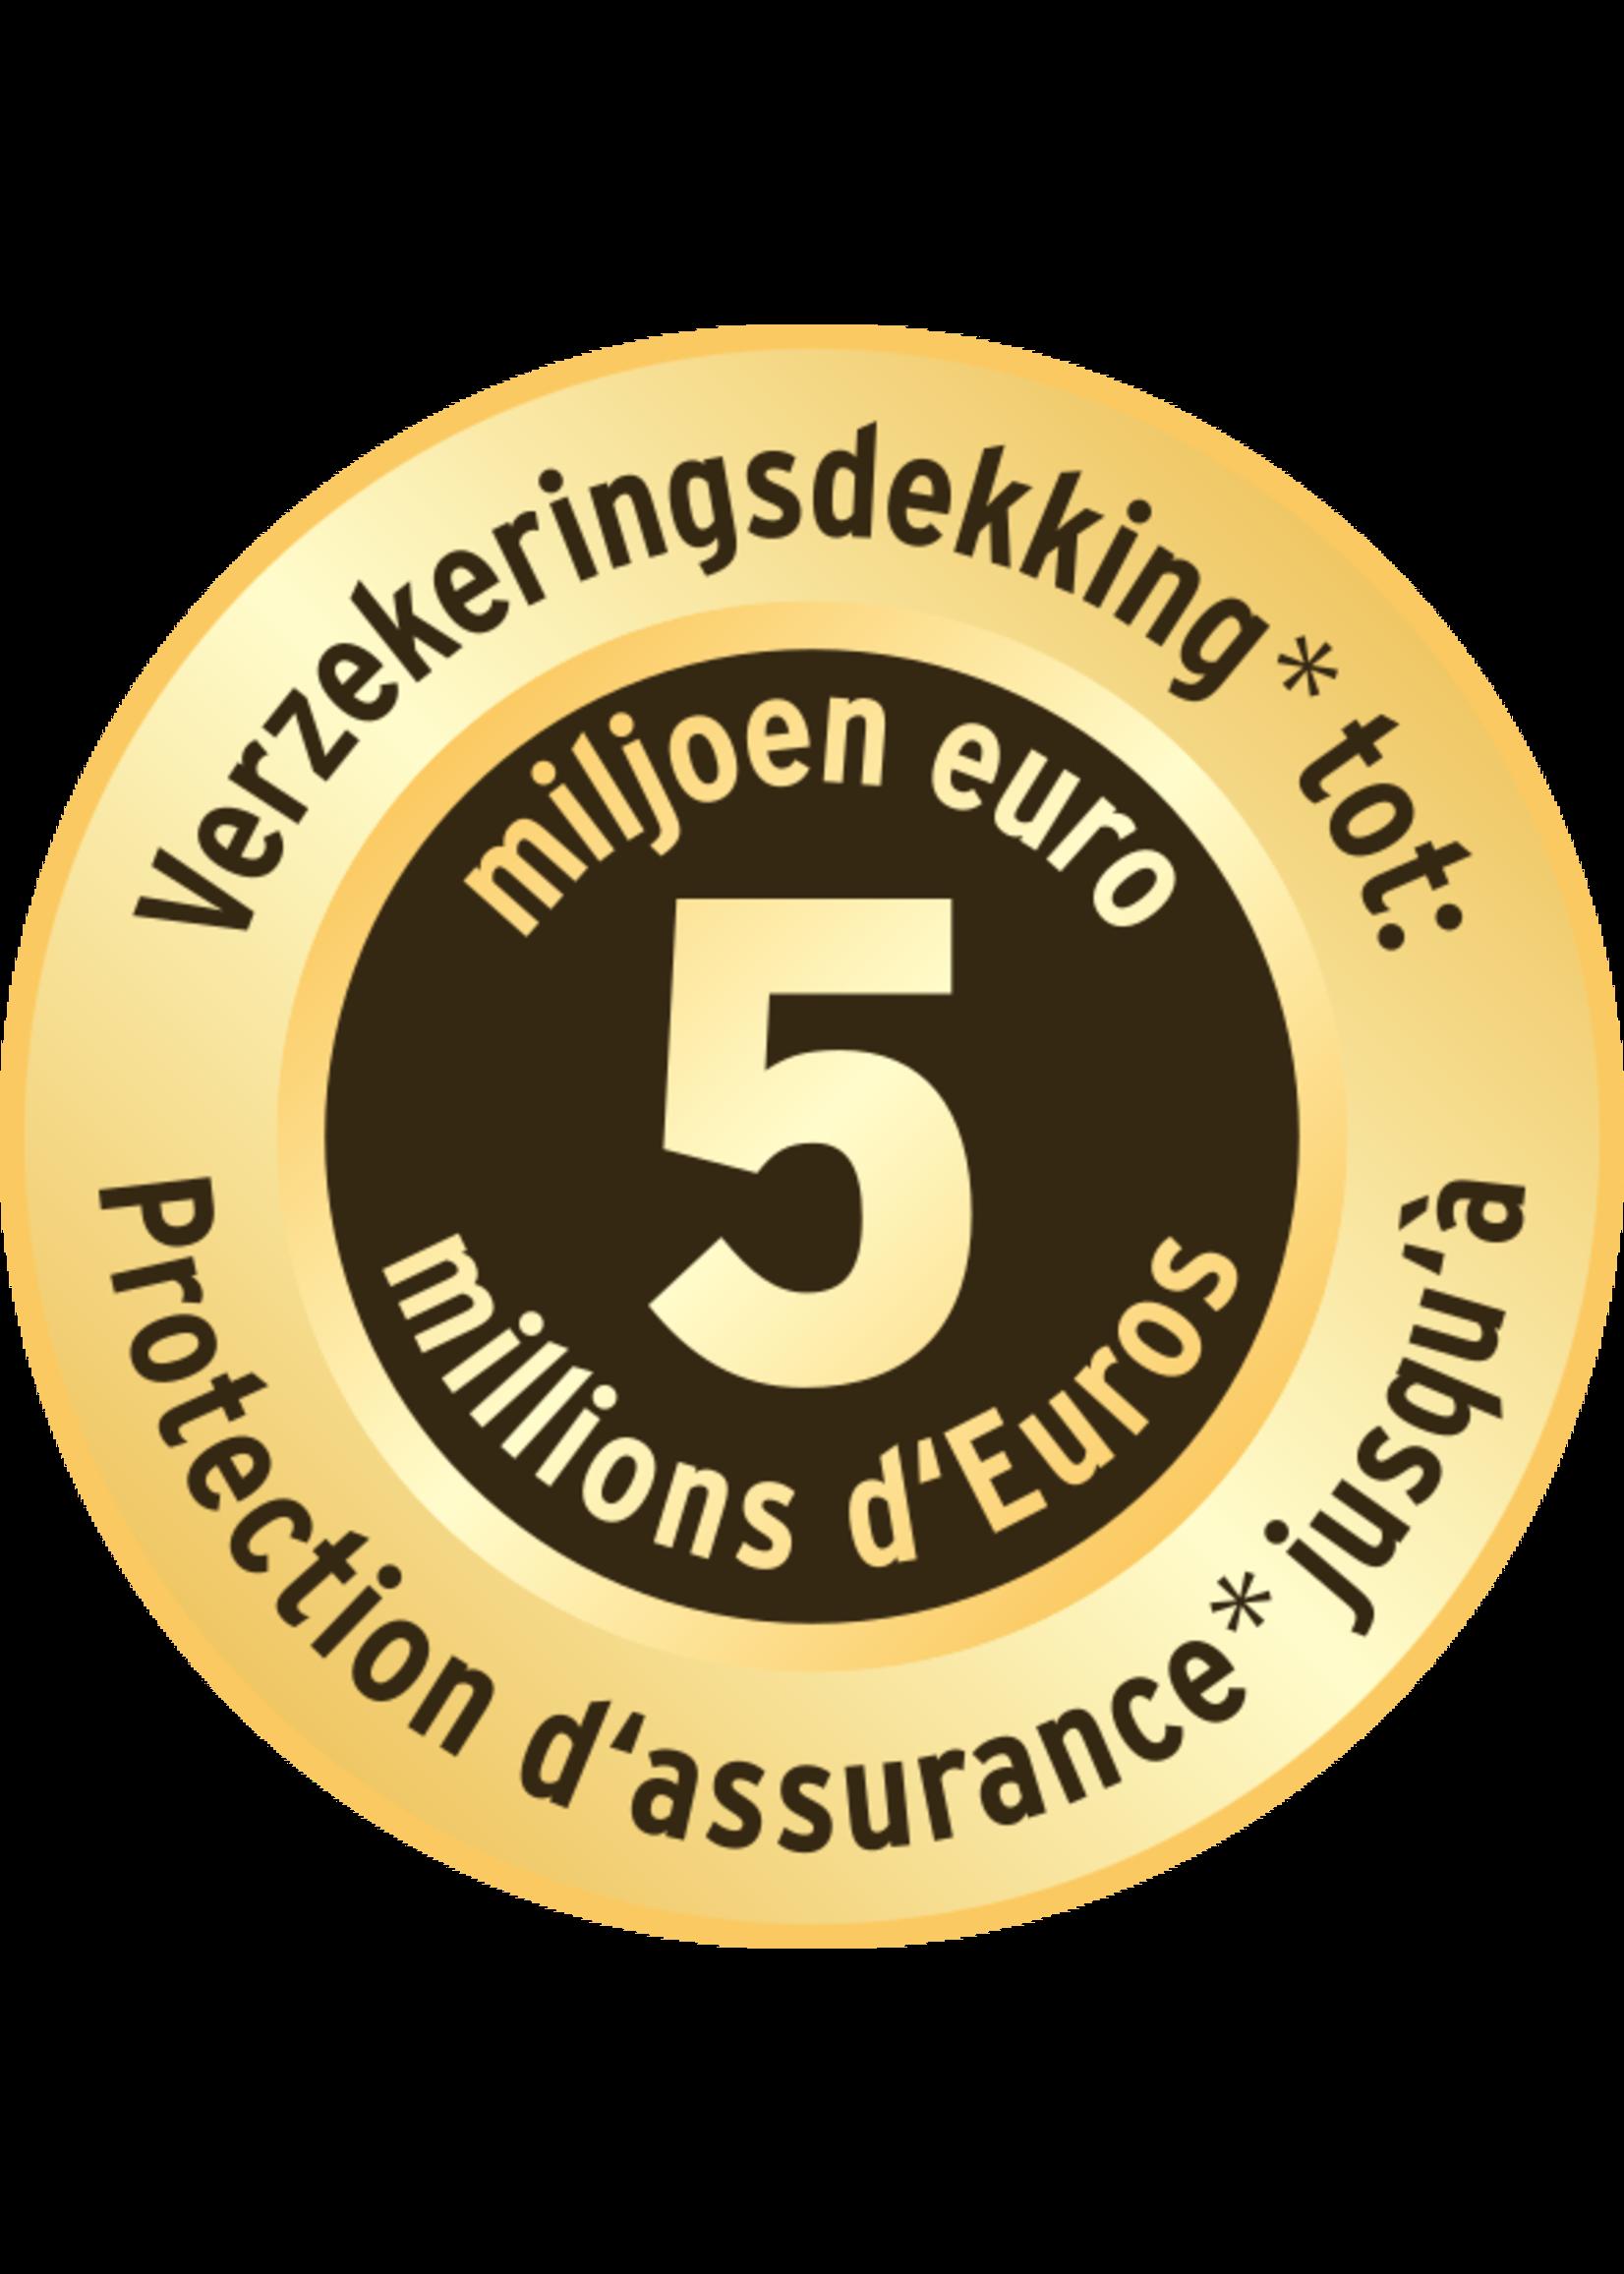 Brennenstuhl Brennenstuhl Eco-Line 13.500A stekkerdoos met overspanningsbeveiliging 4-voudig lichtgrijs 1.5m H05VV-F 3G1.5 *FR*